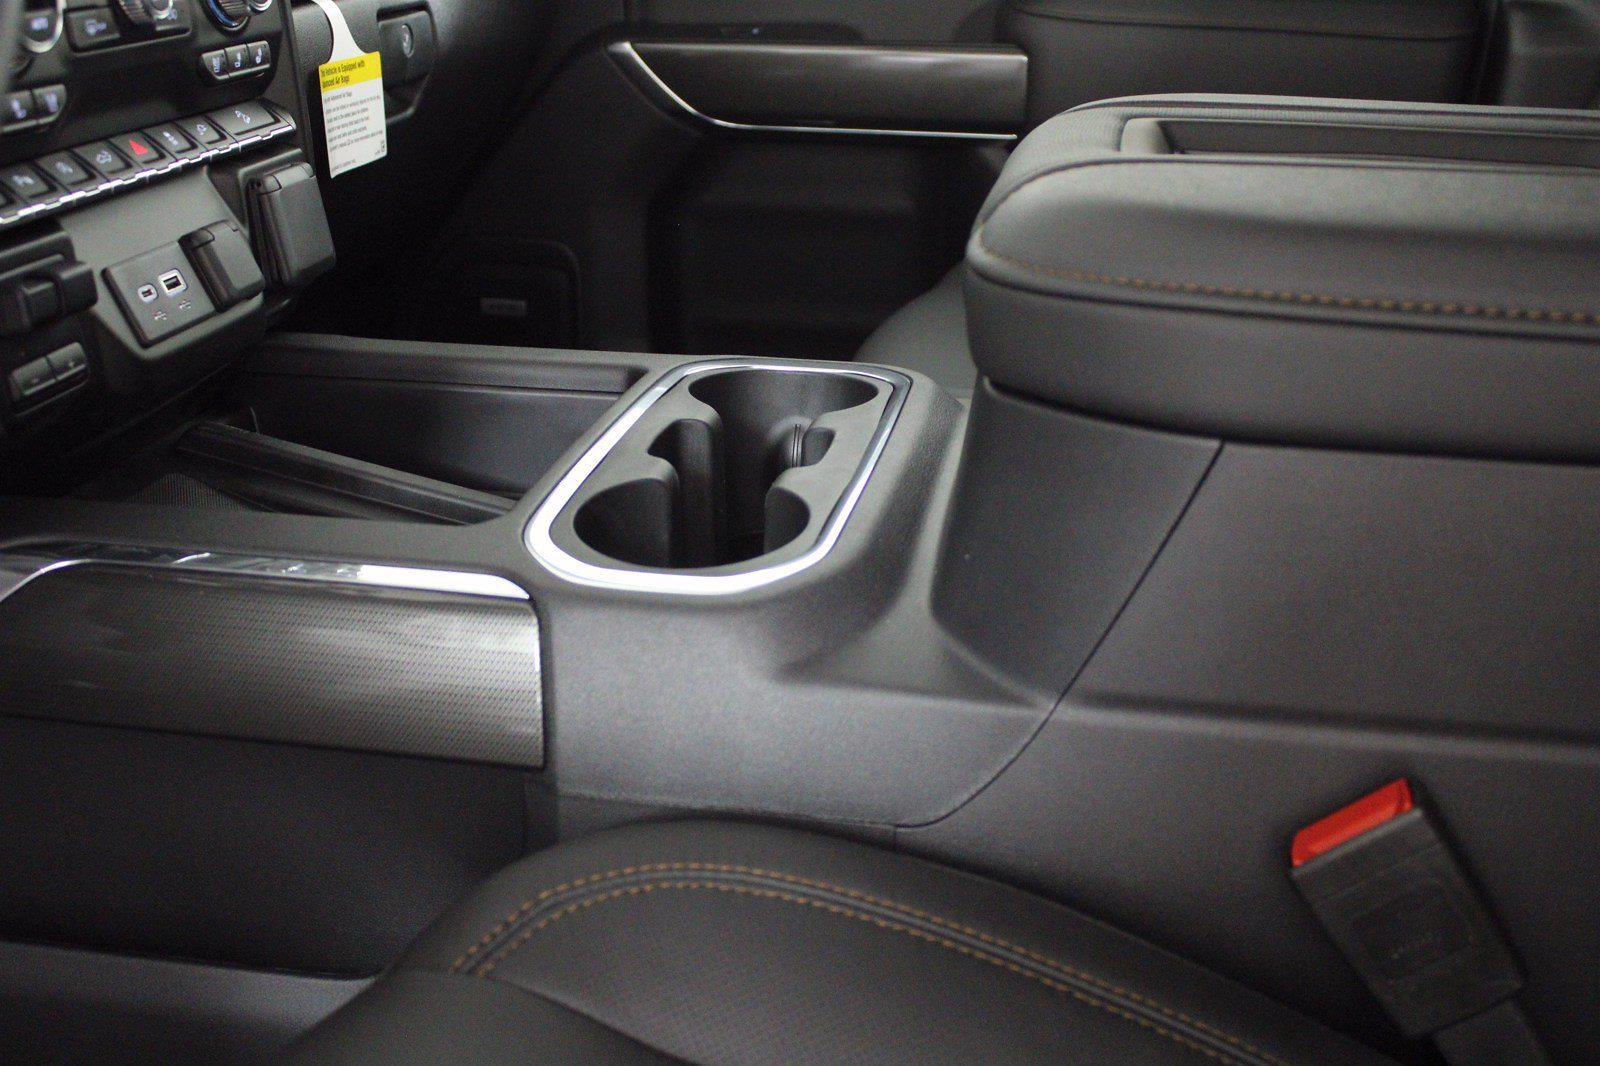 2021 GMC Sierra 1500 Crew Cab 4x4, Pickup #D410846 - photo 13